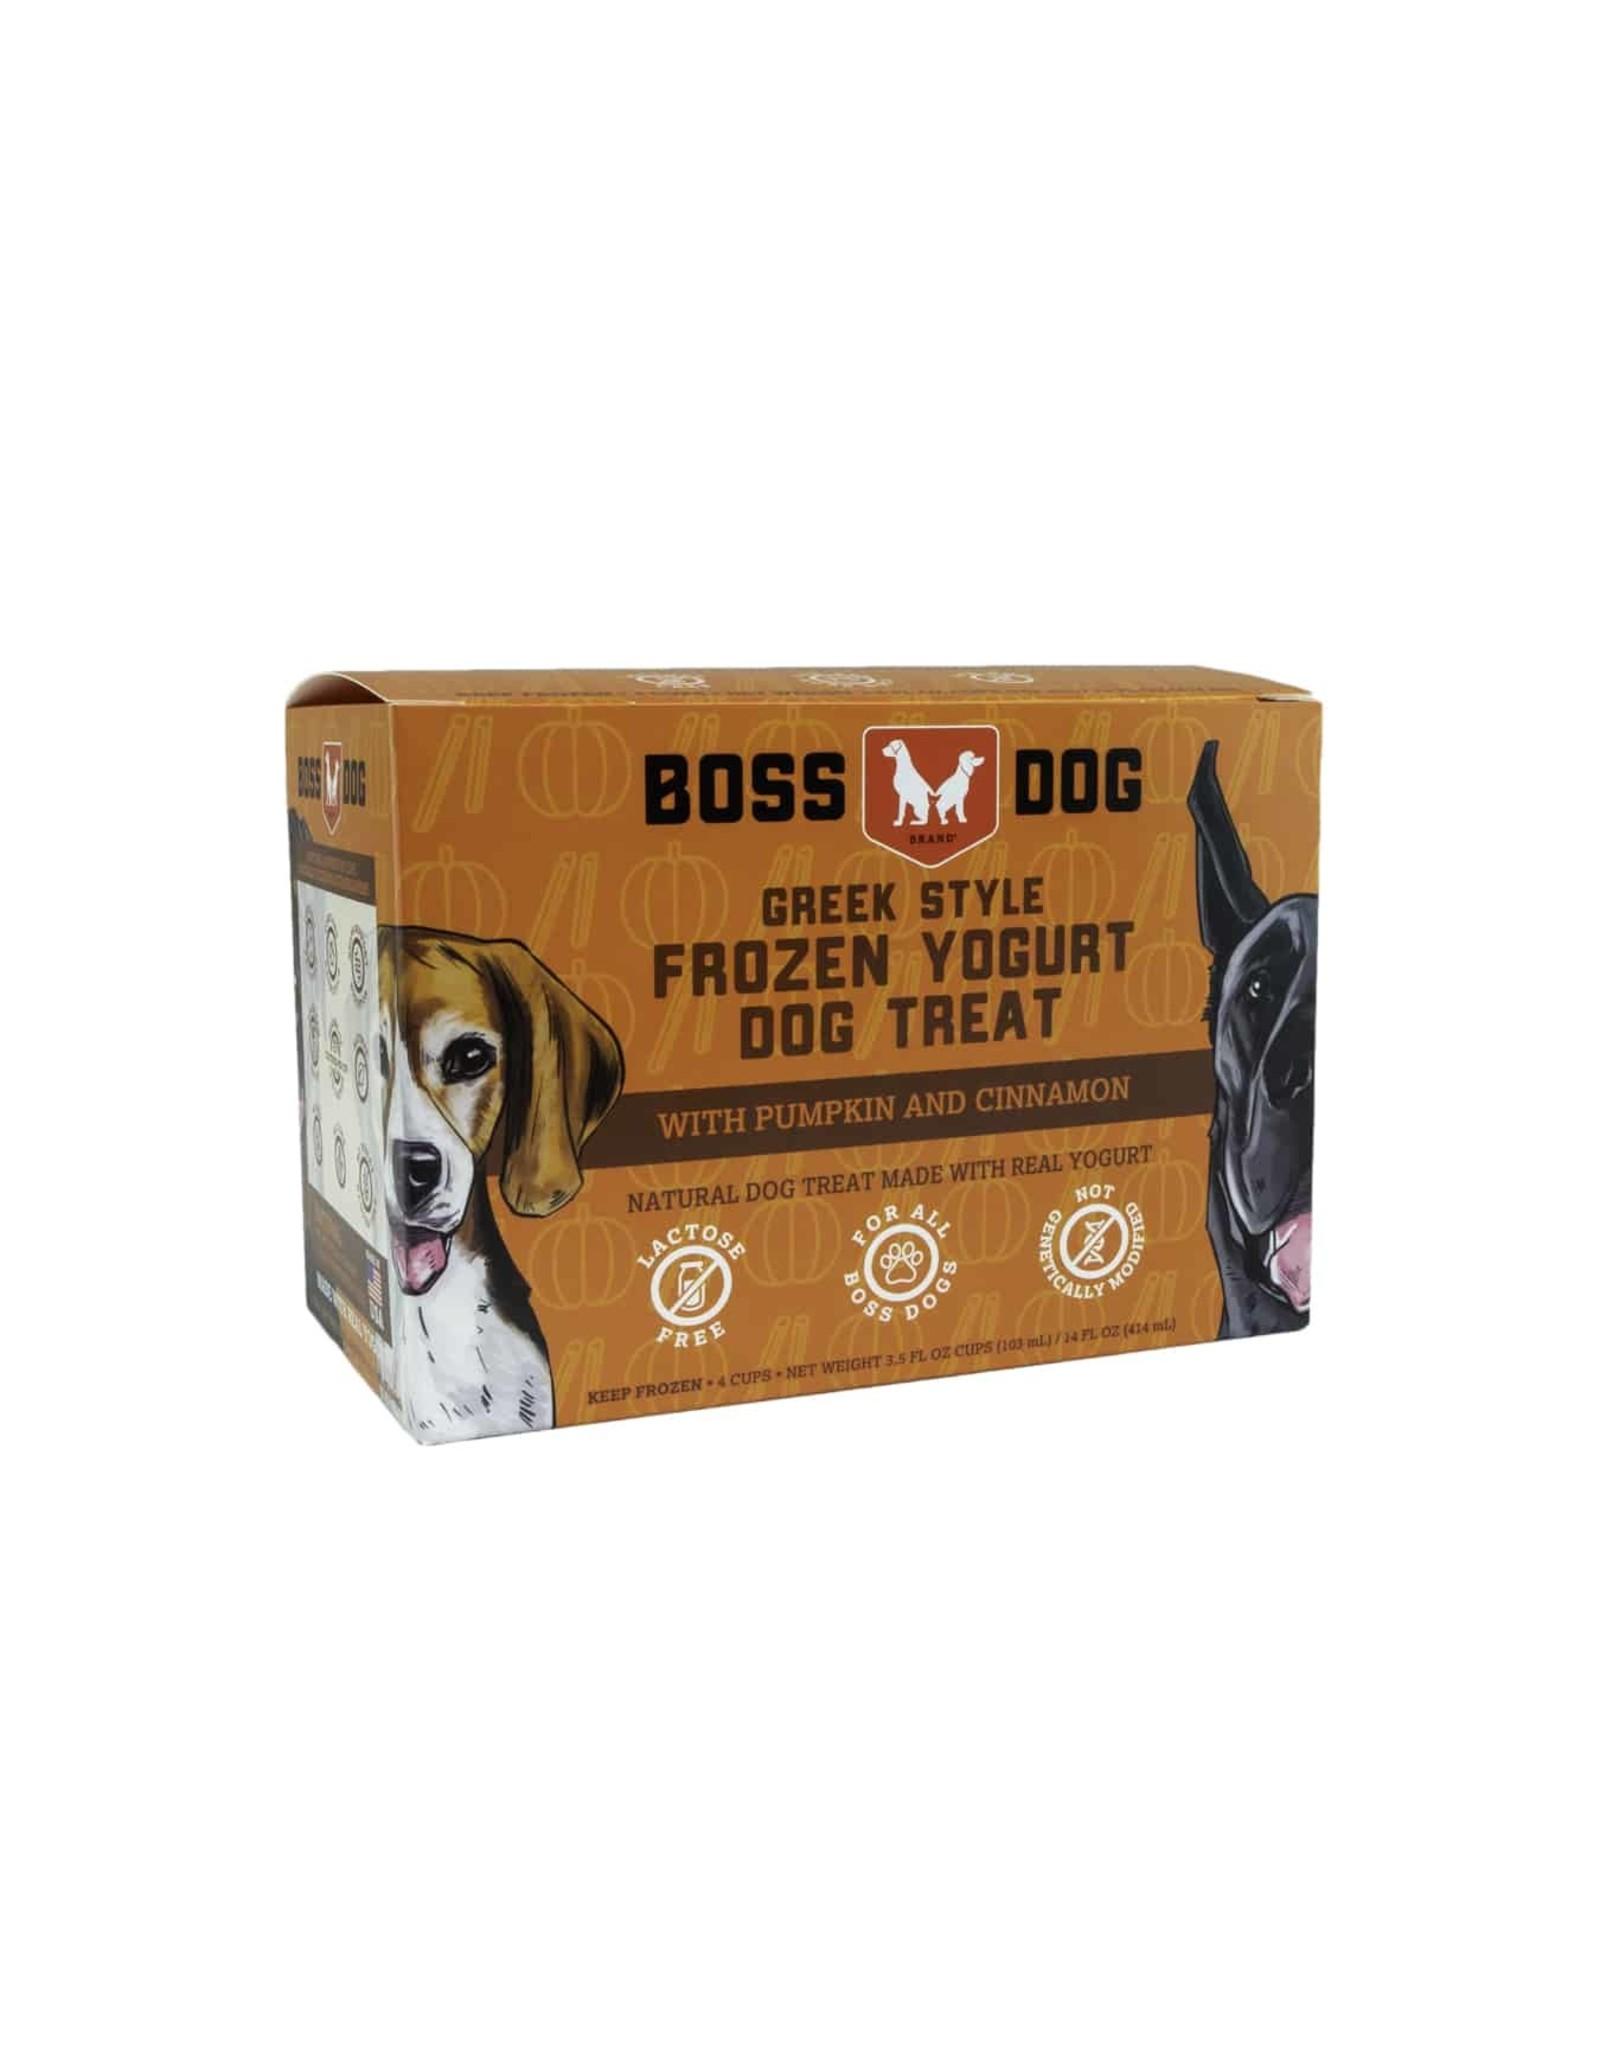 Boss Dog Boss Dog - Frozen Yogurt Pumpkin and Cinnamon 4pk